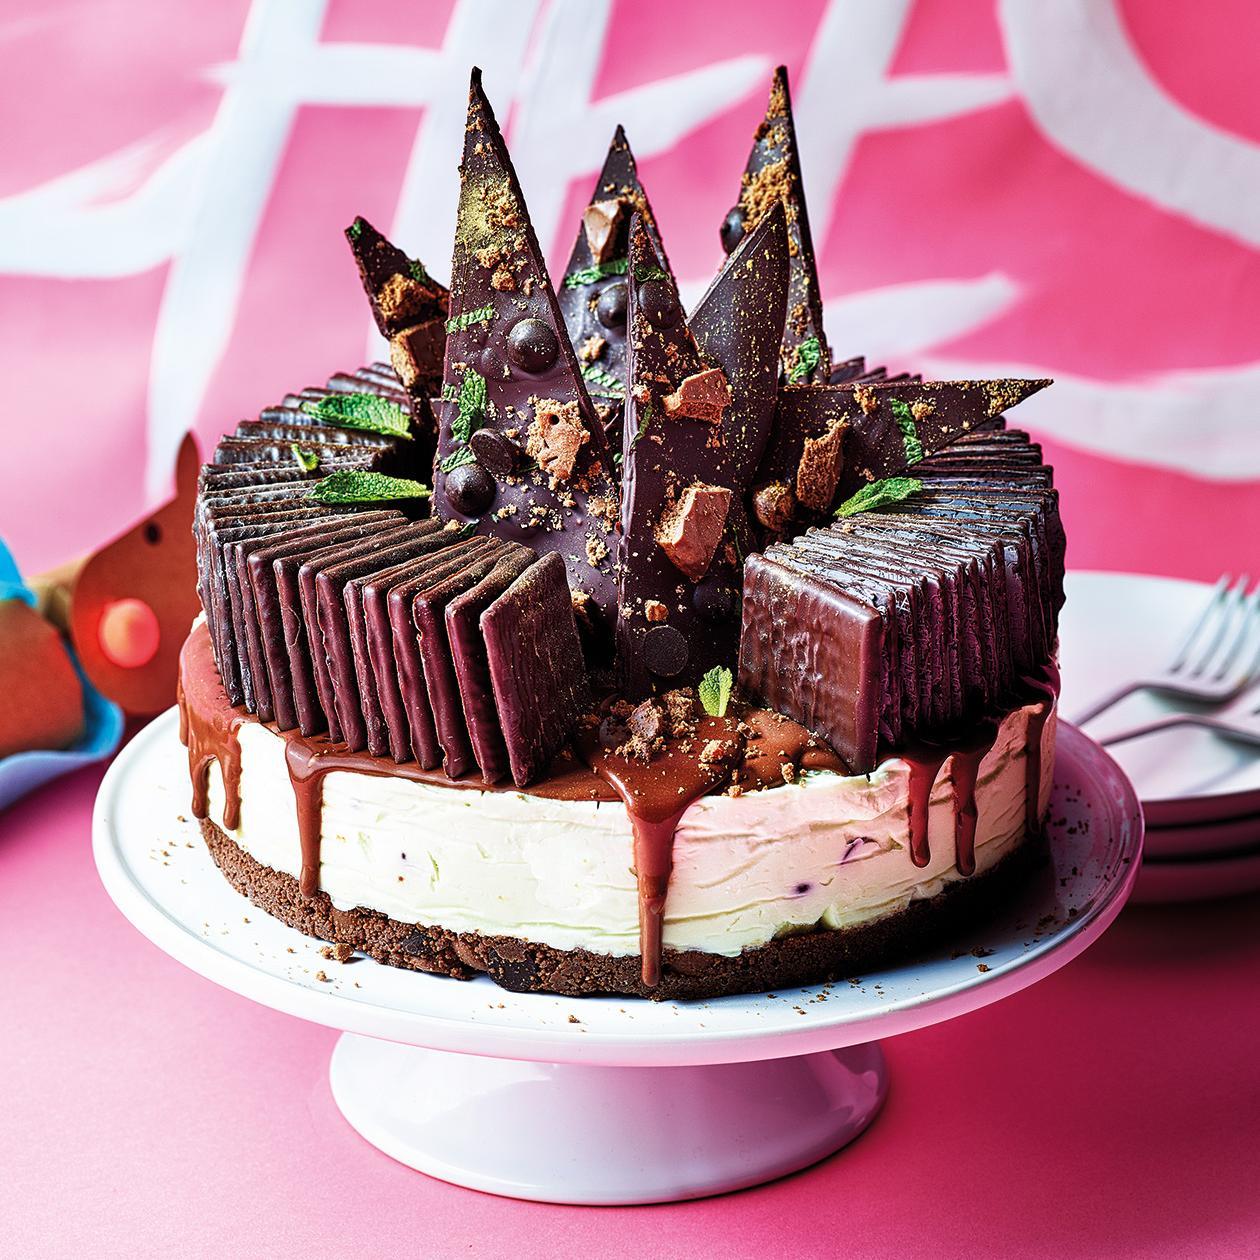 Astonishing After Eight Cheesecake Recipe Sainsburys Magazine Personalised Birthday Cards Petedlily Jamesorg